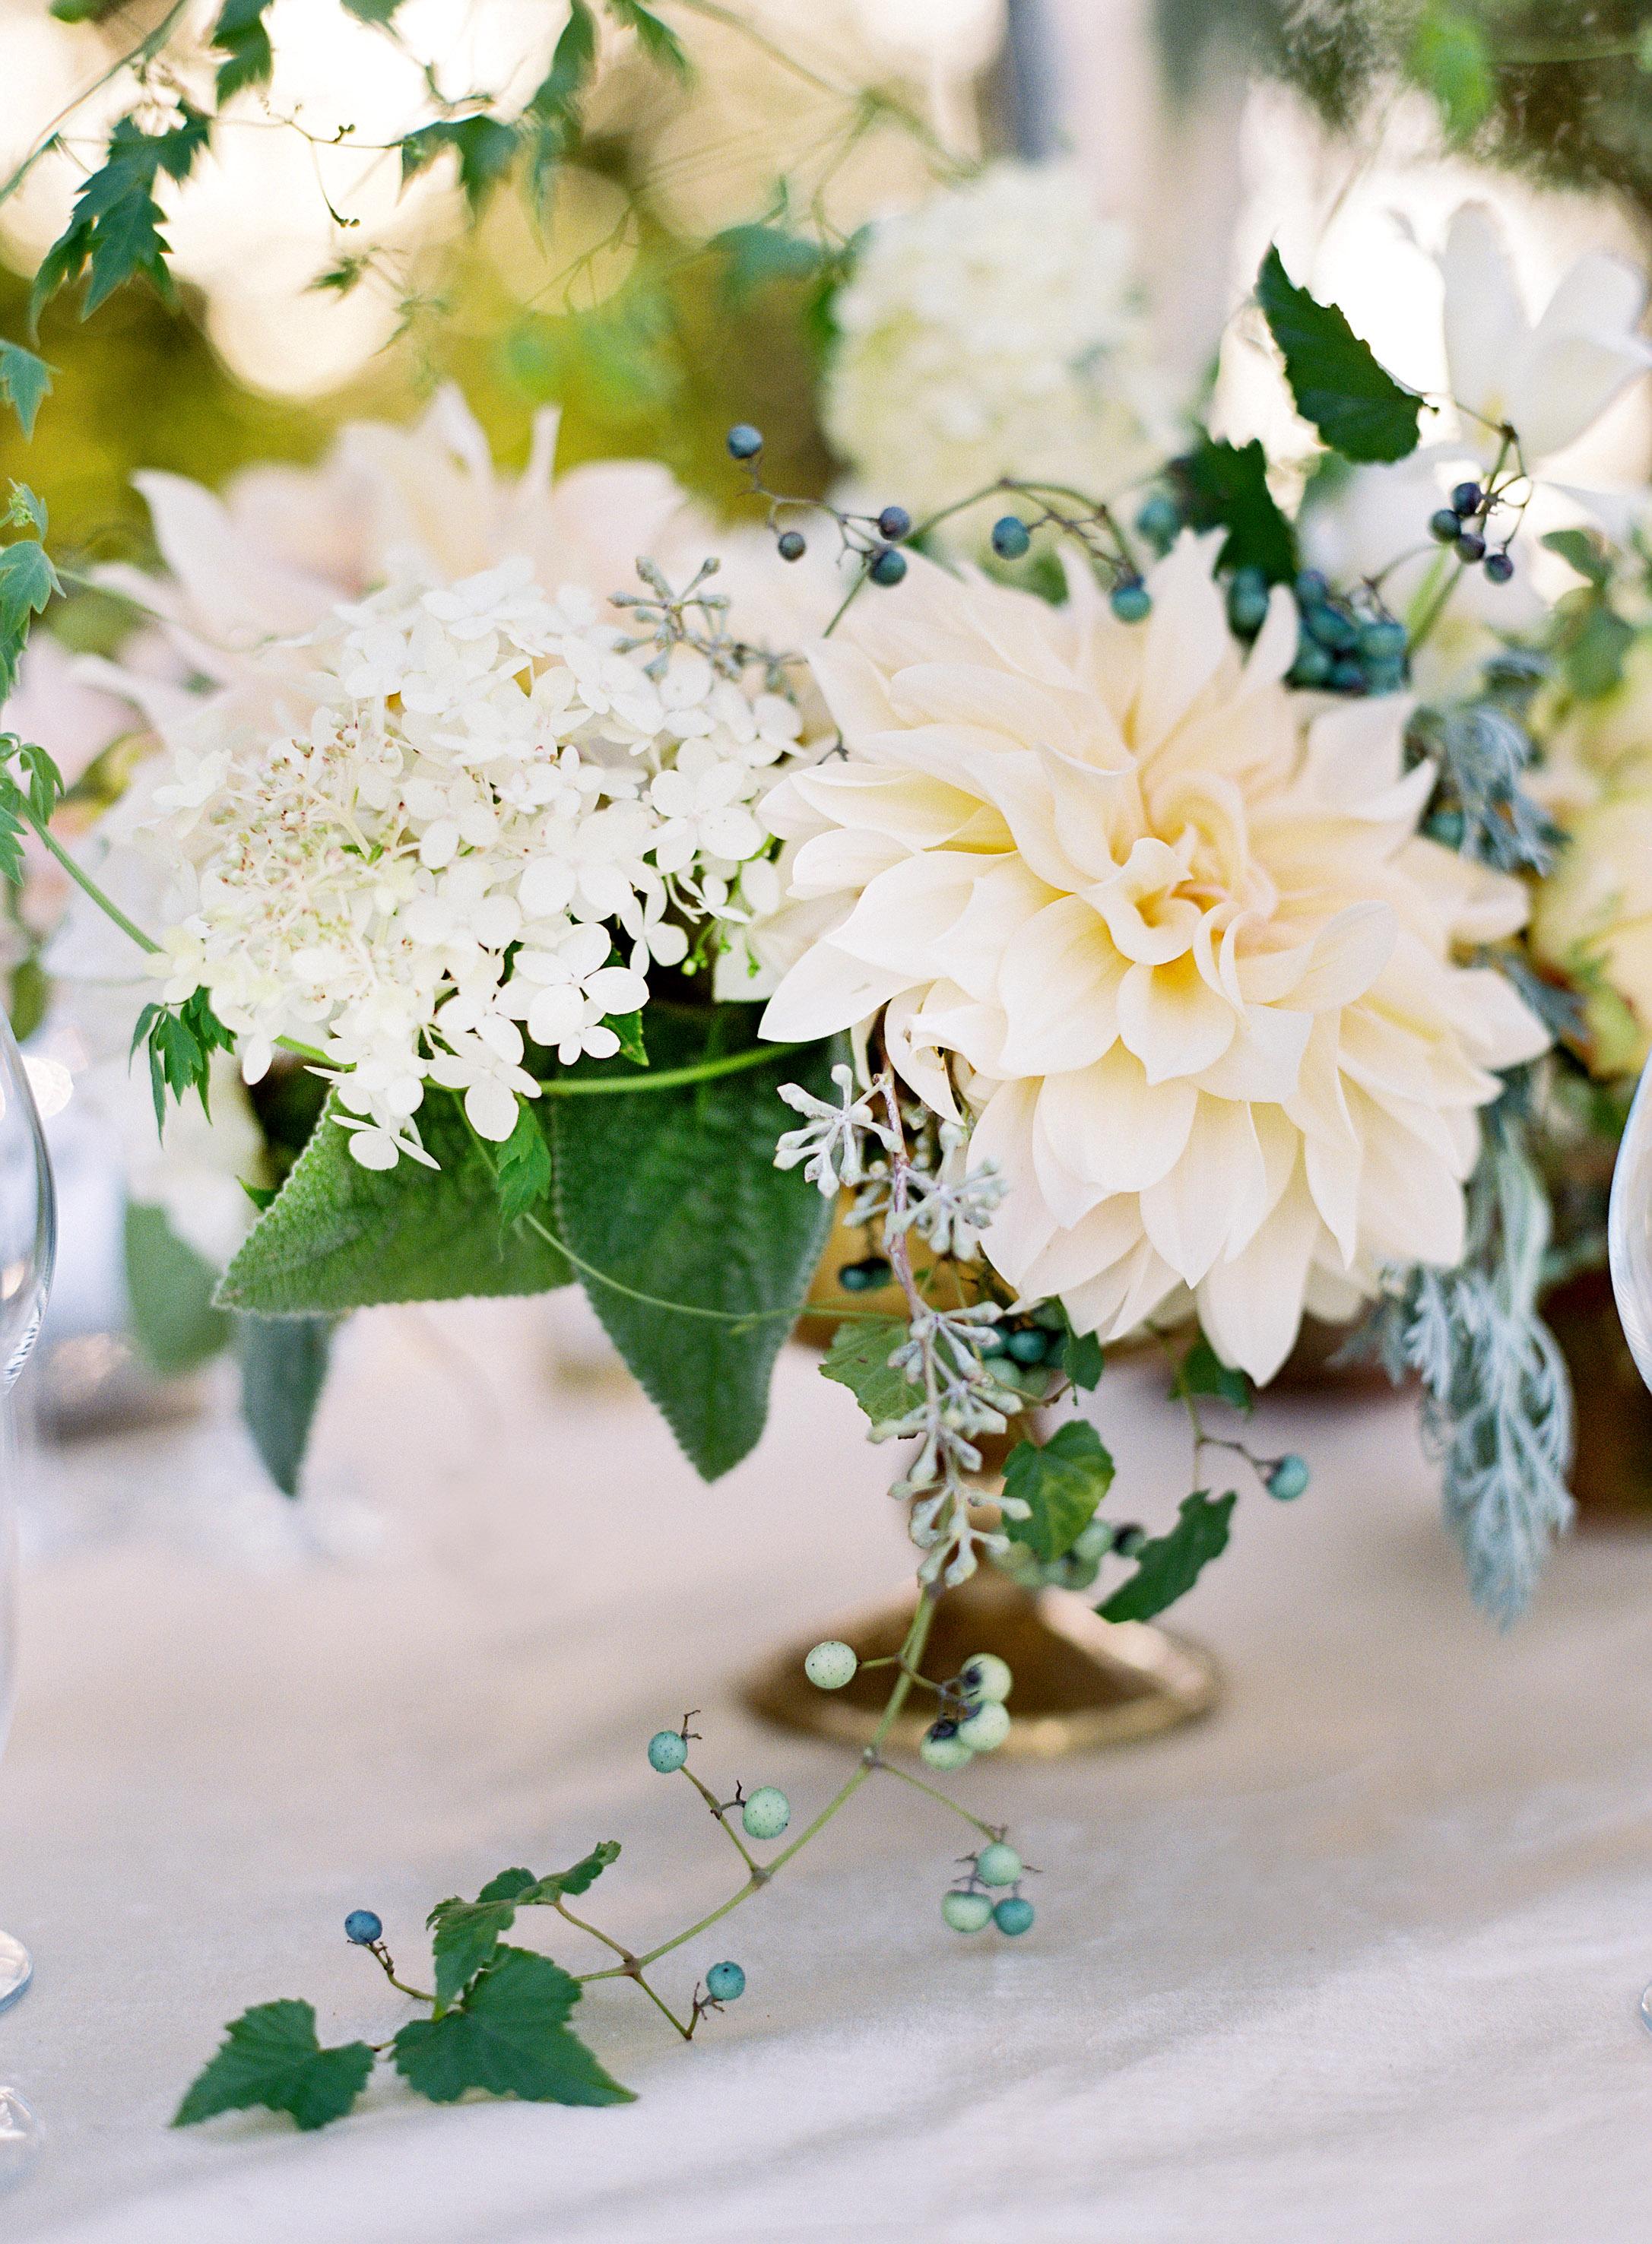 dahlia wedding centerpieces white flowers and greenery